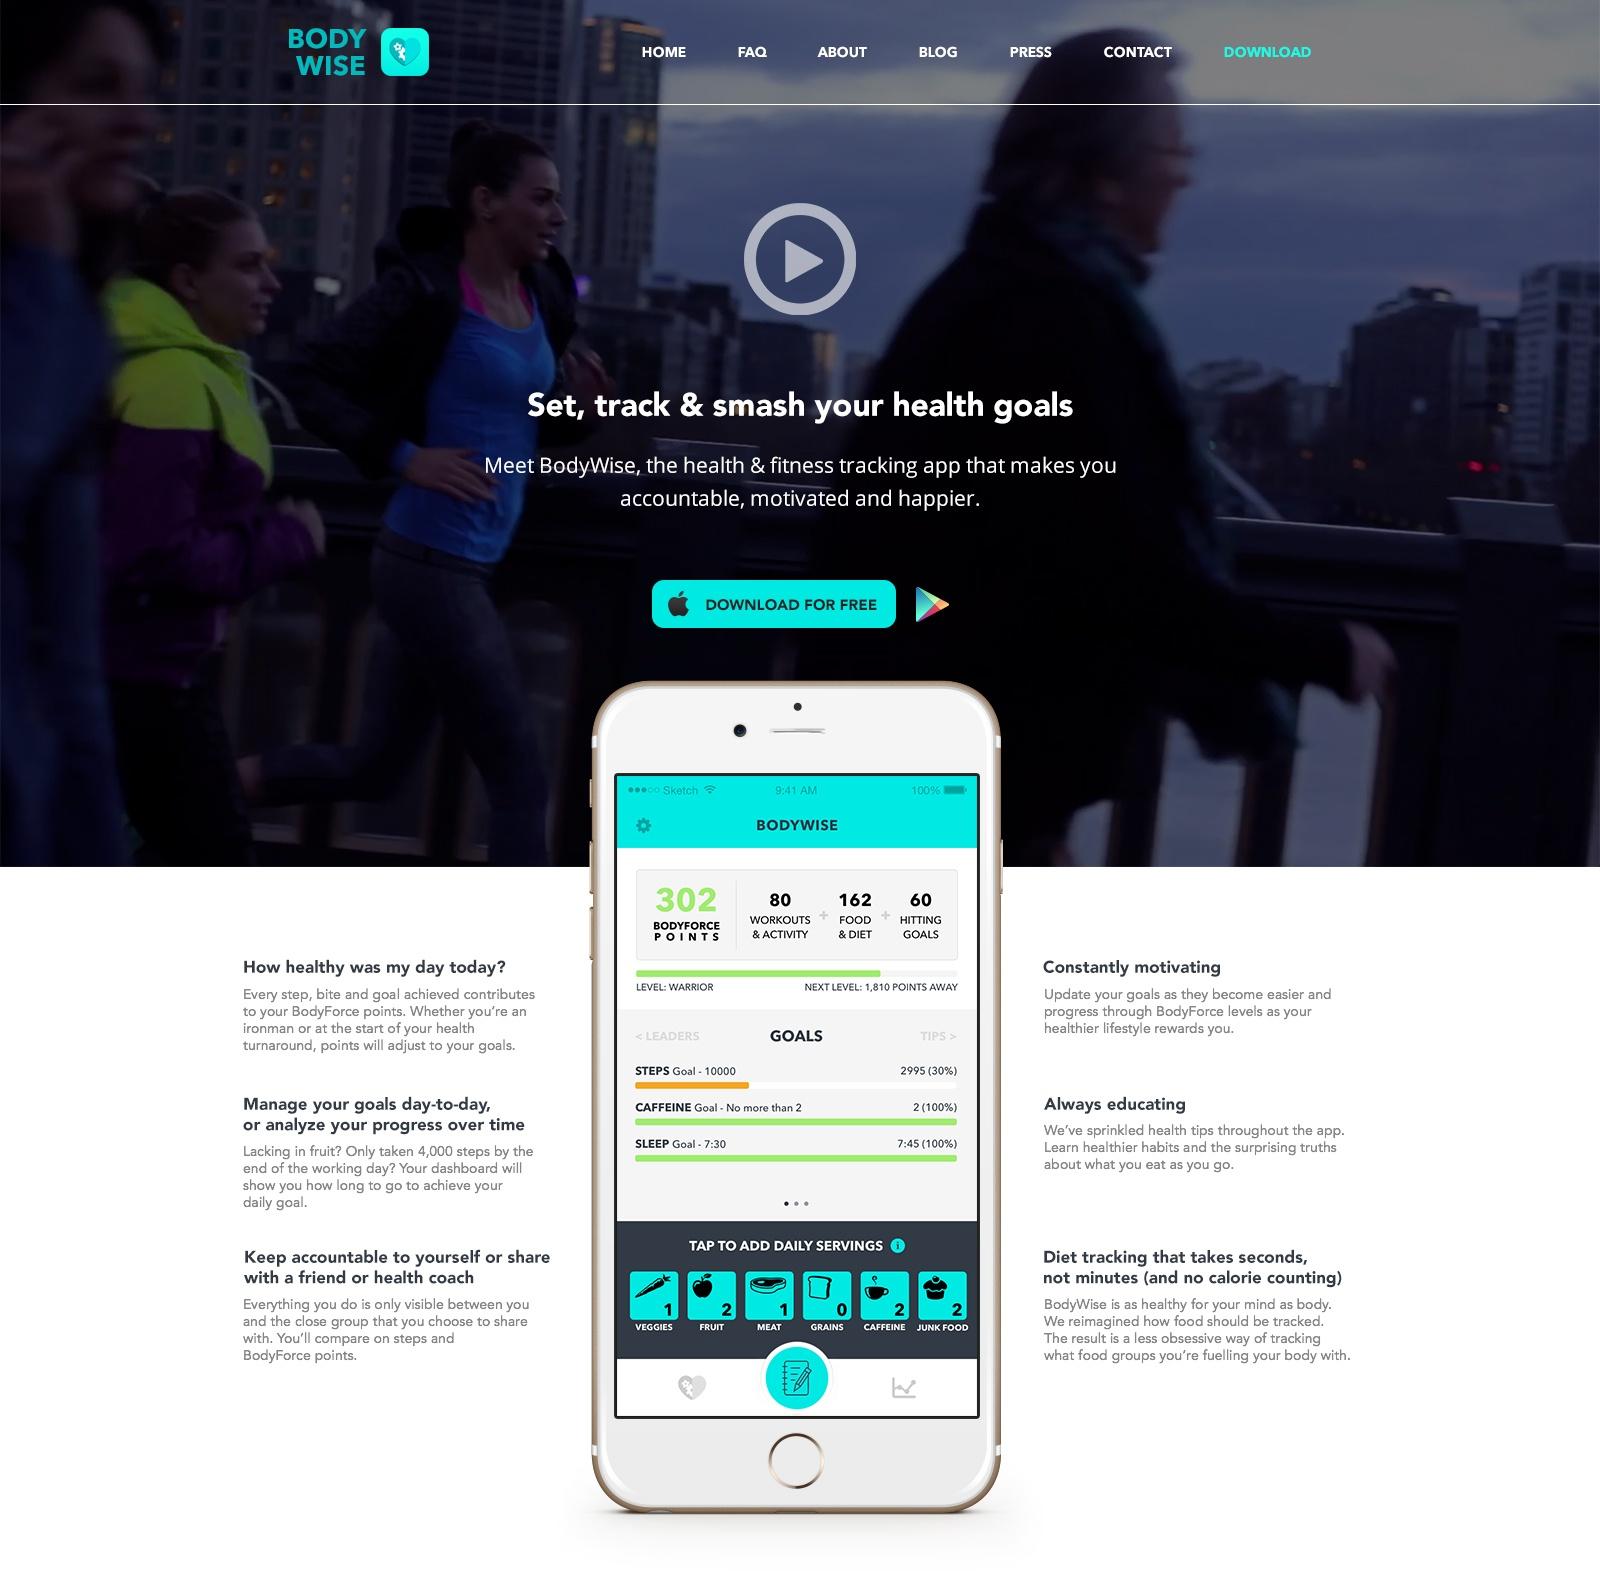 BodyWise Web Design